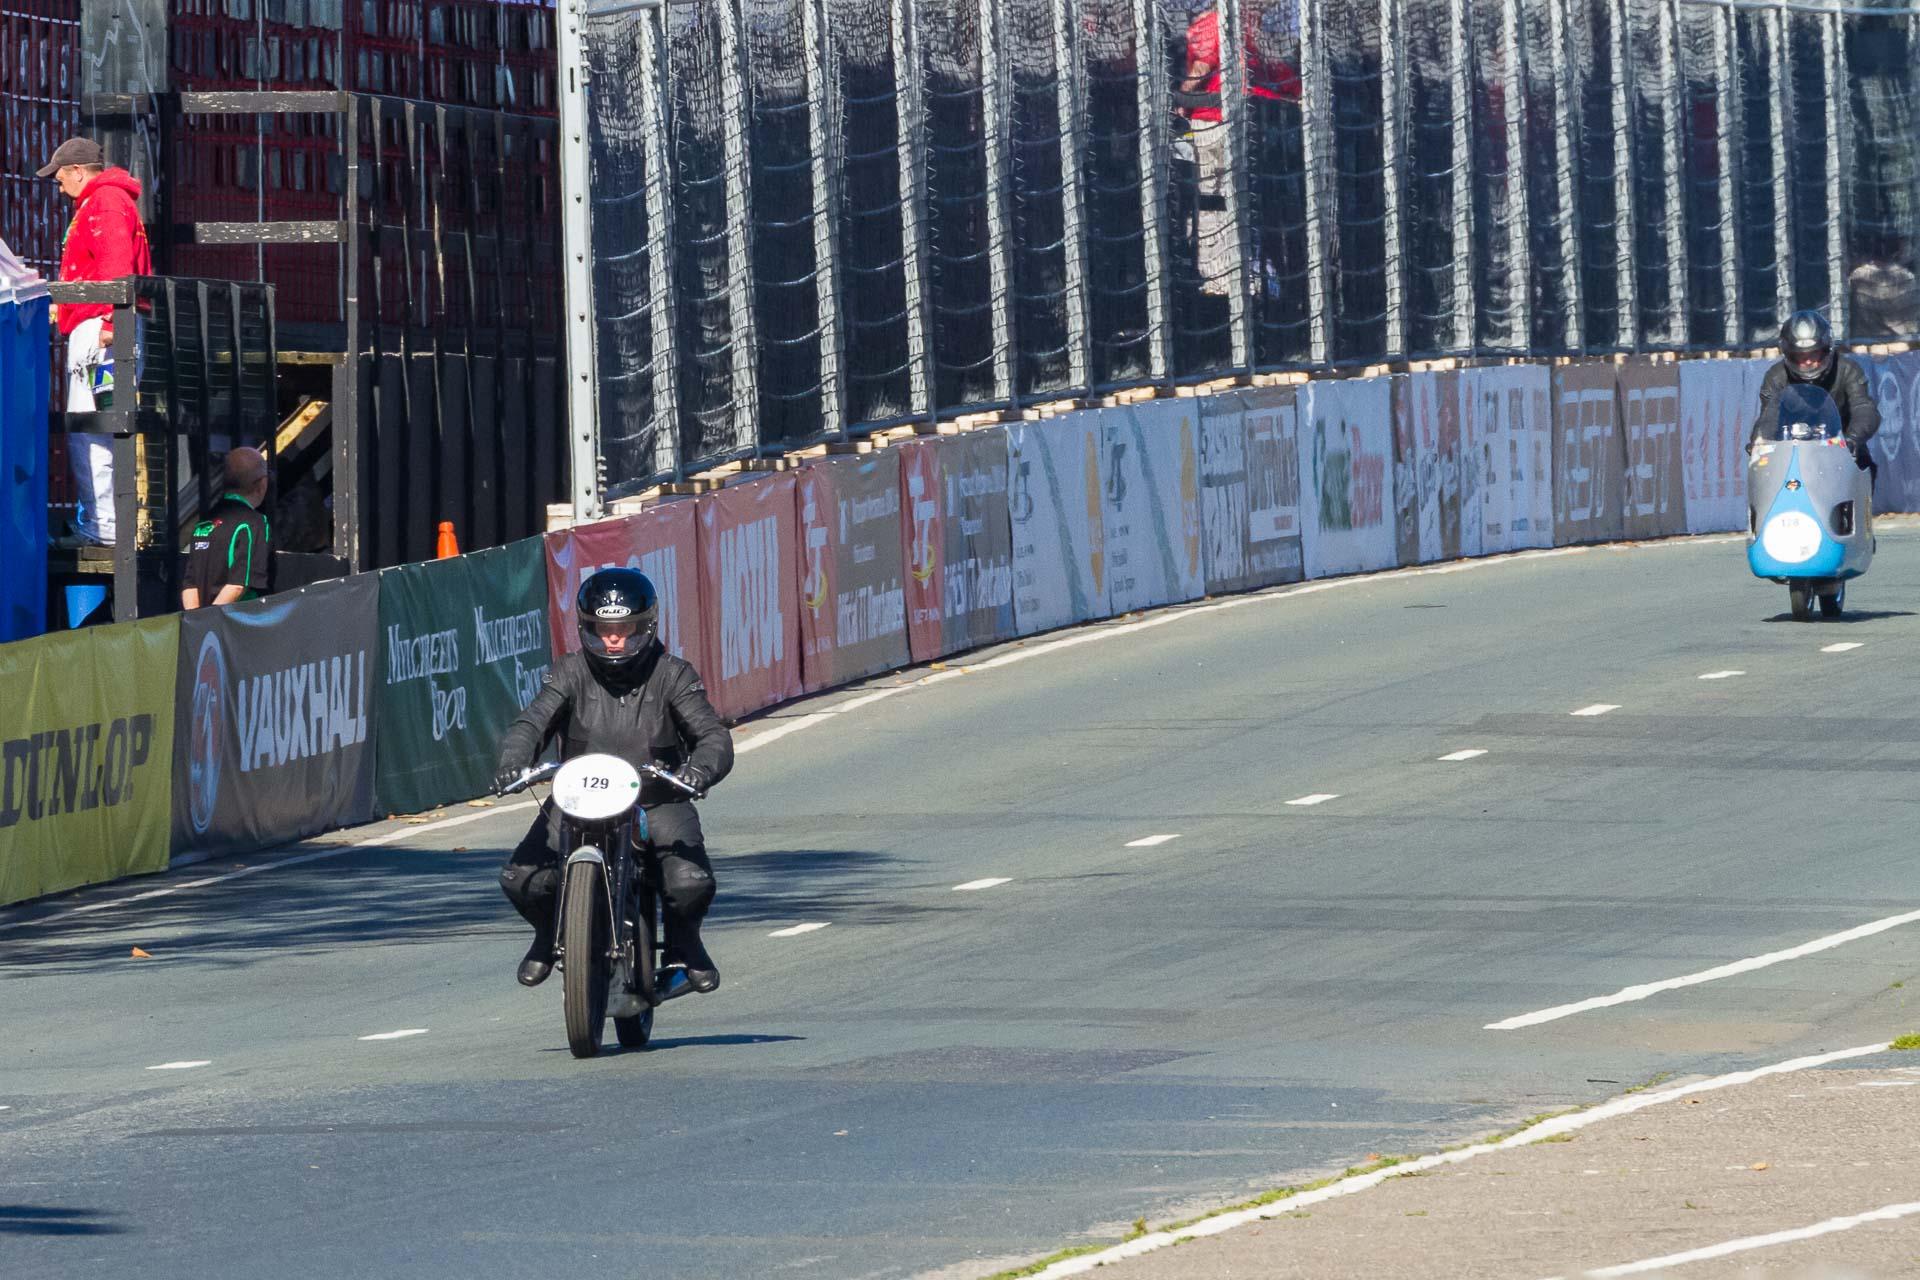 Simone auf der AWO R 425 beim Start zur Classic TT Lap of Honour. Foto: Krause/MotorPhoto.de